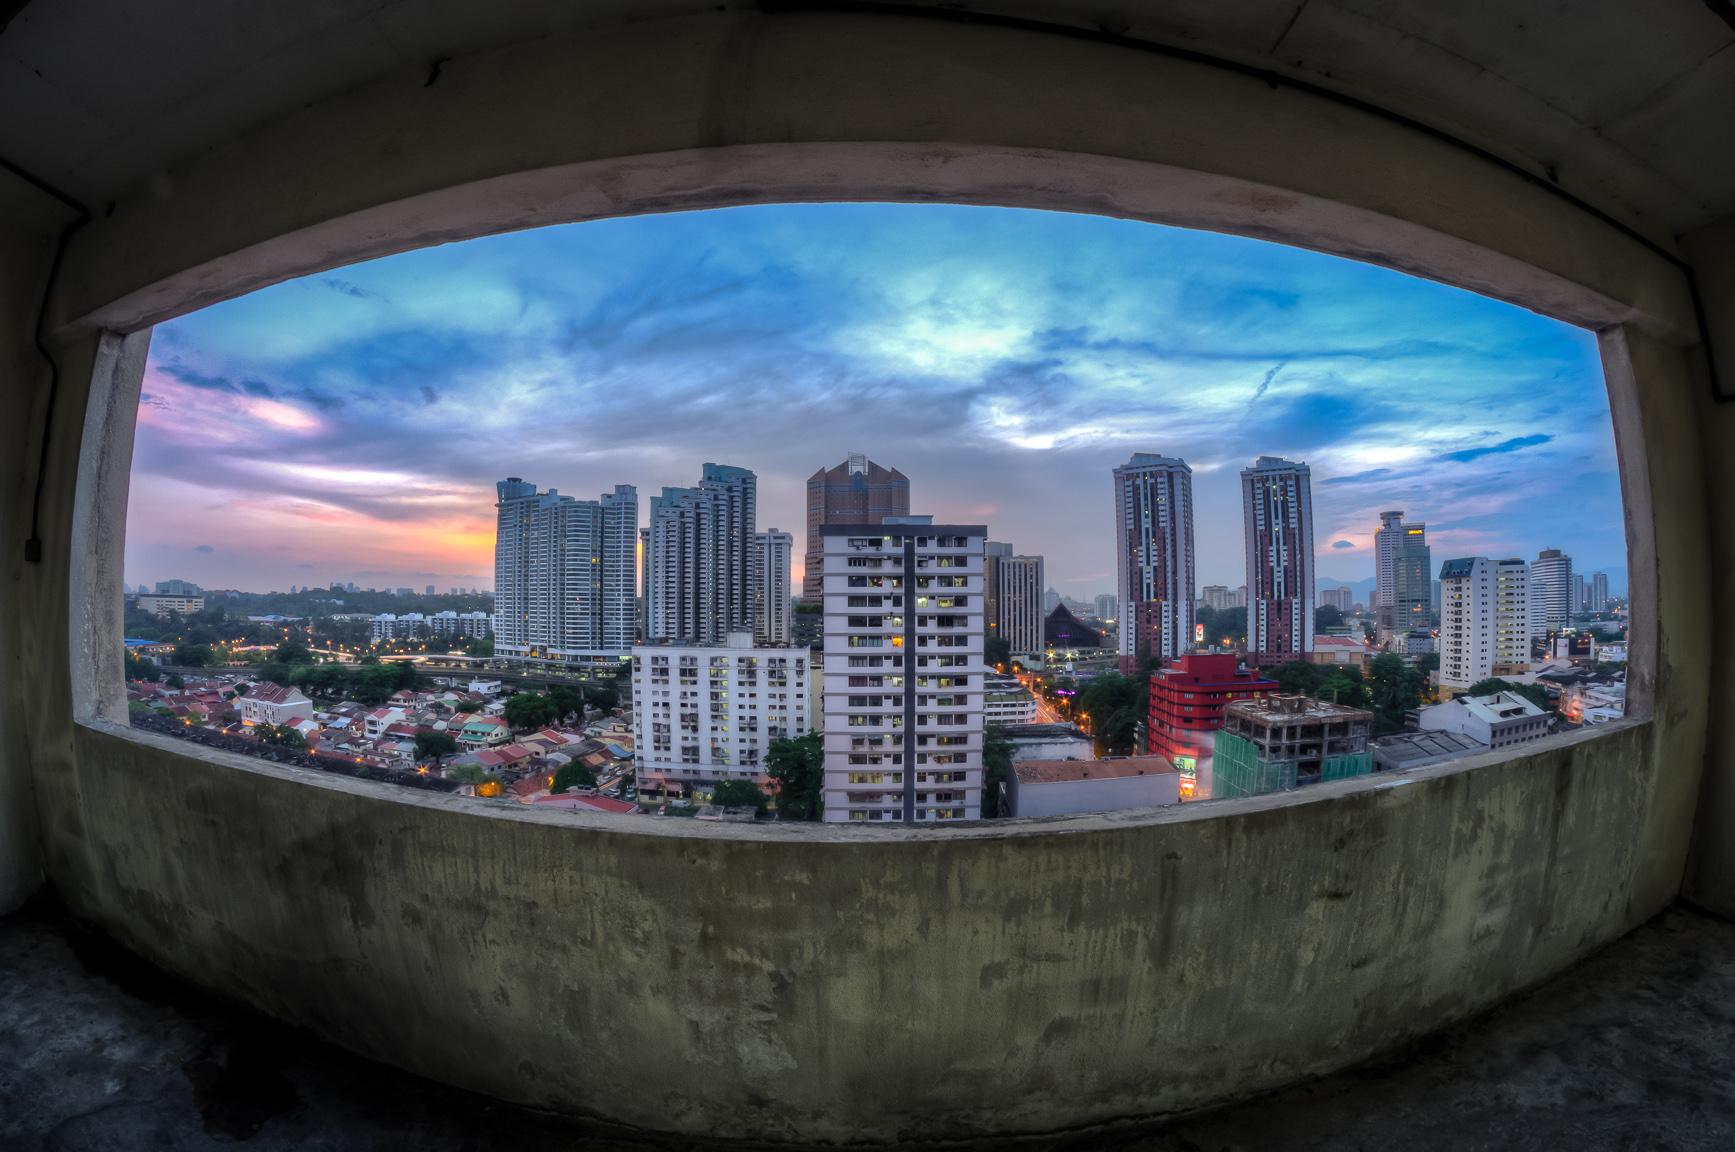 Wallpaper : landscape, window, sunset, city, cityscape, architecture ...